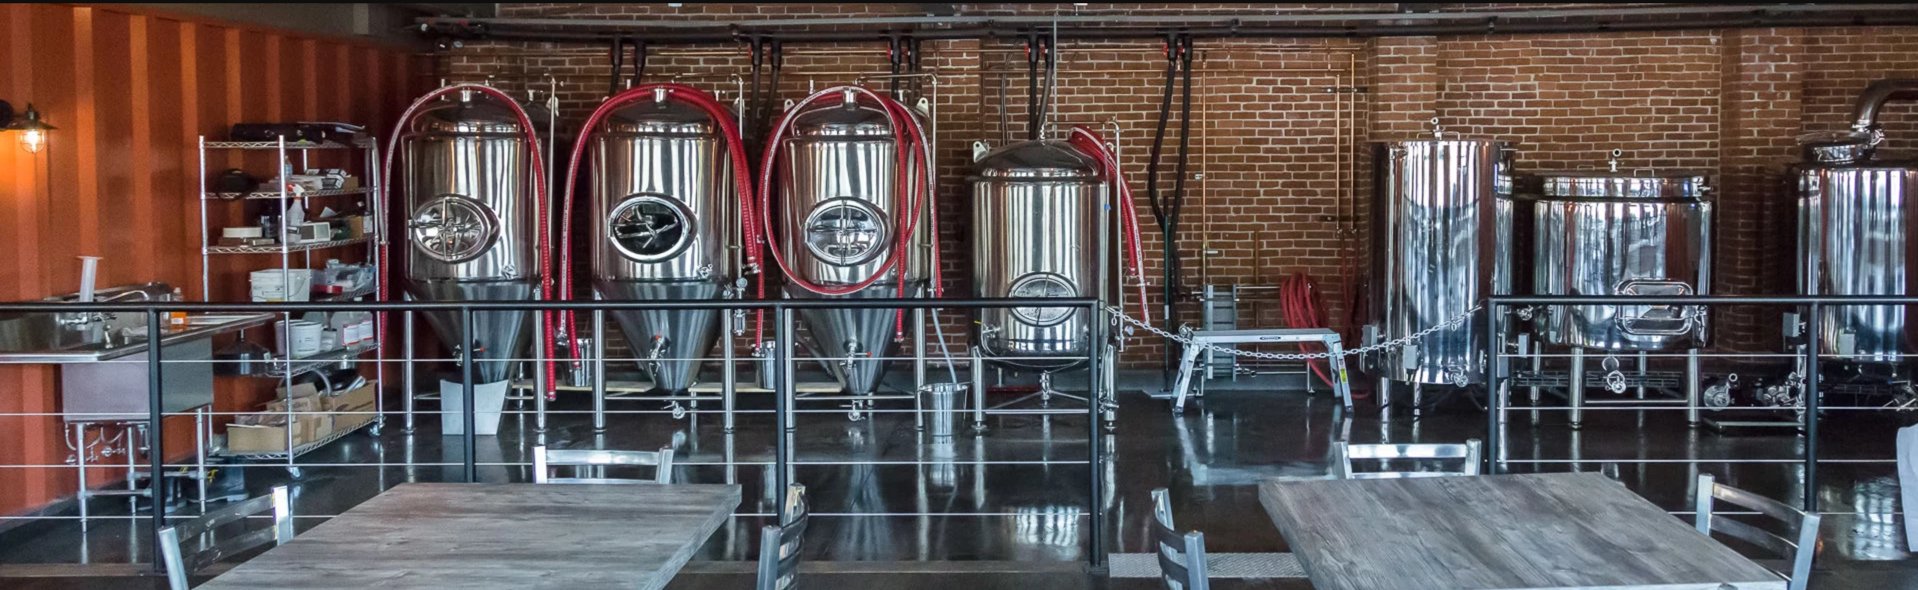 Lost Tavern Brewing